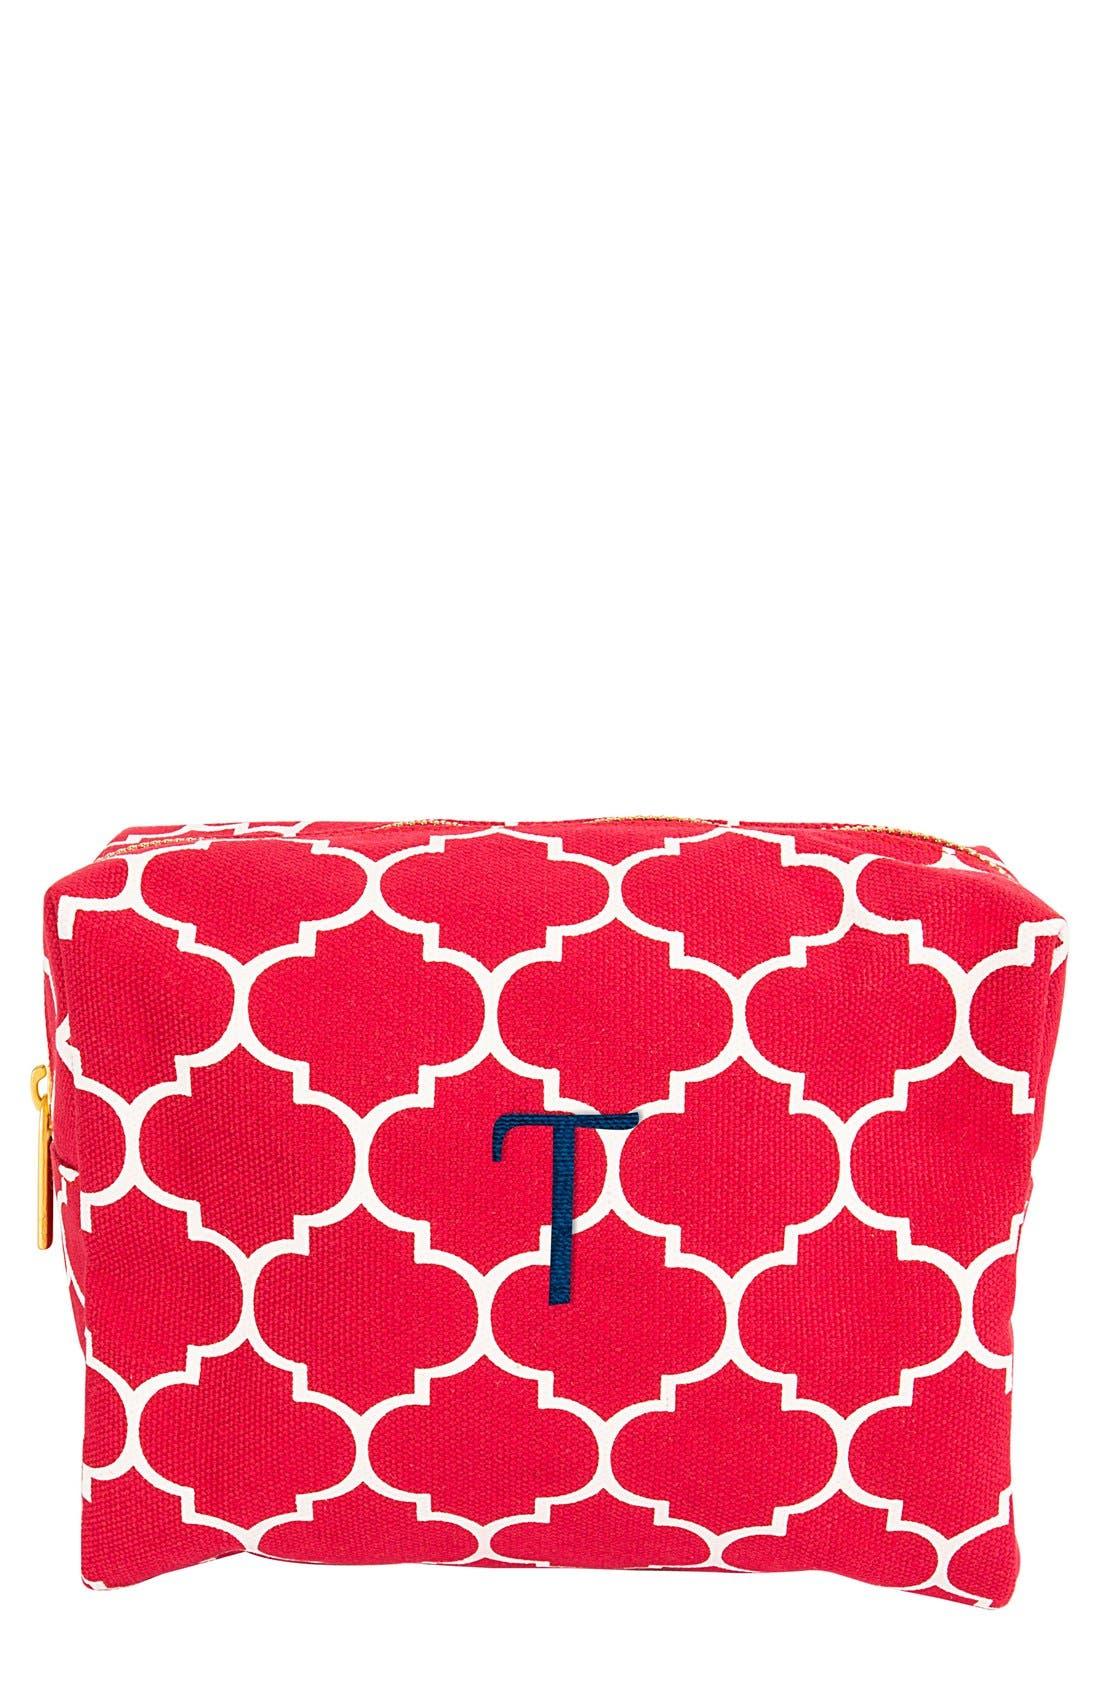 Monogram Cosmetics Bag,                         Main,                         color, Coral-T